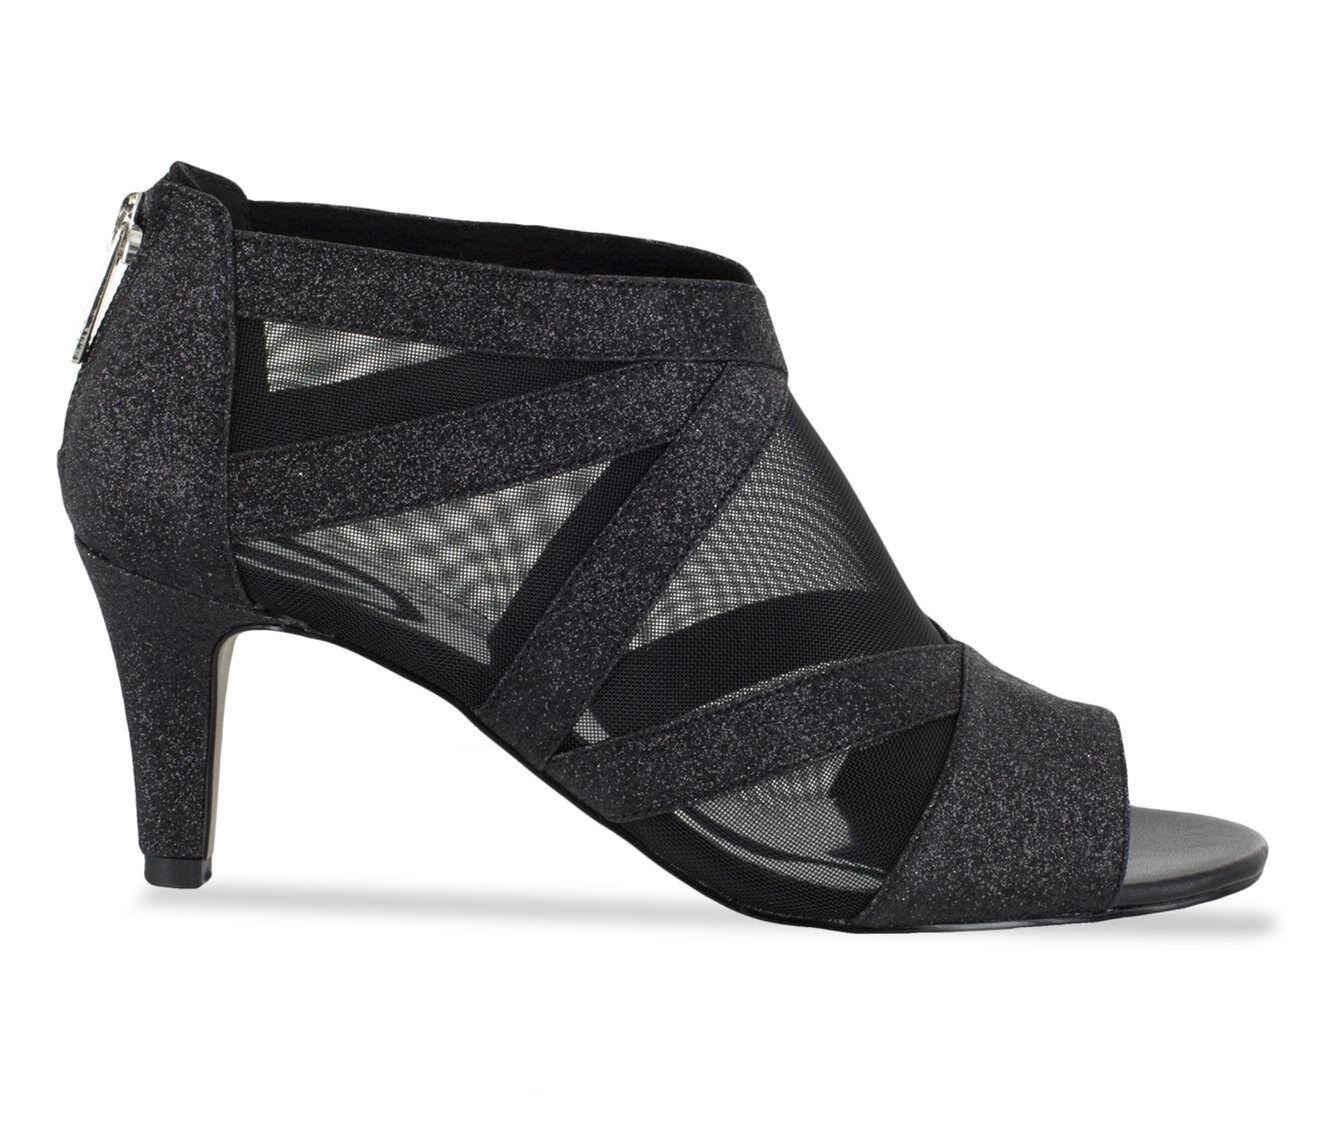 Women's Easy Street Dazzle Heeled Dress Sandals Black Glitter